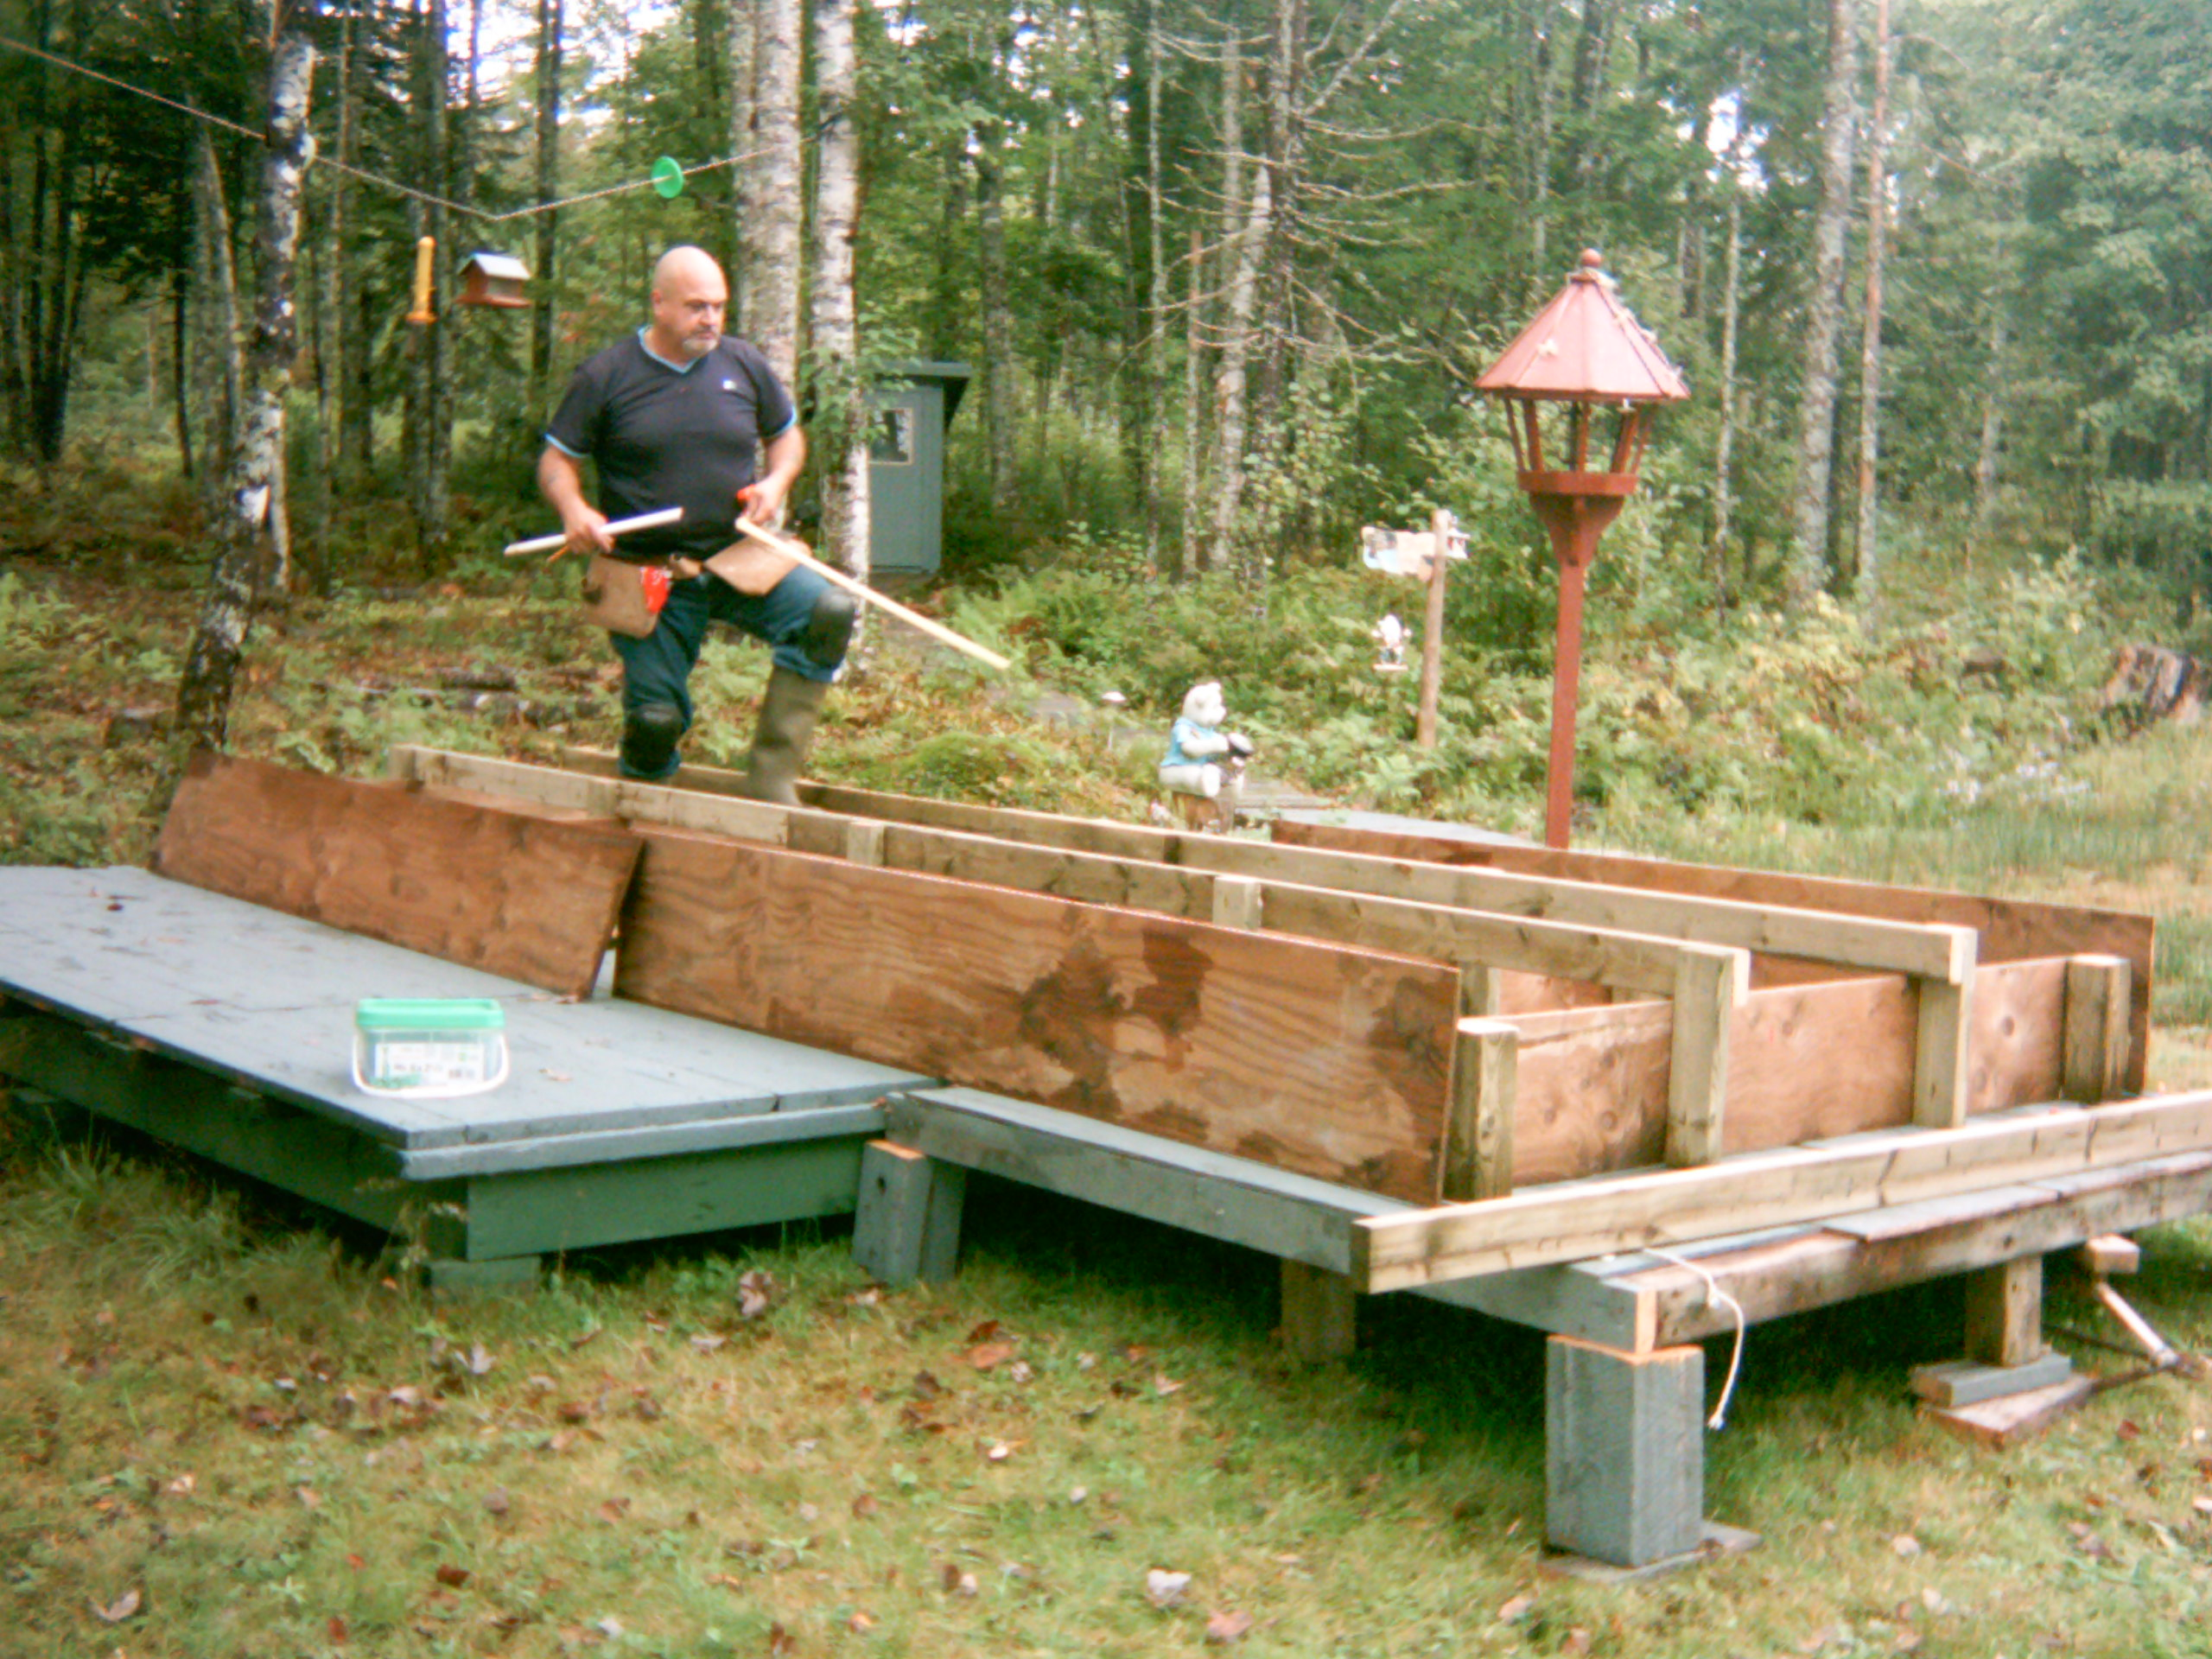 Floating barrel dock plans omahdesigns net for Small pond dock plans